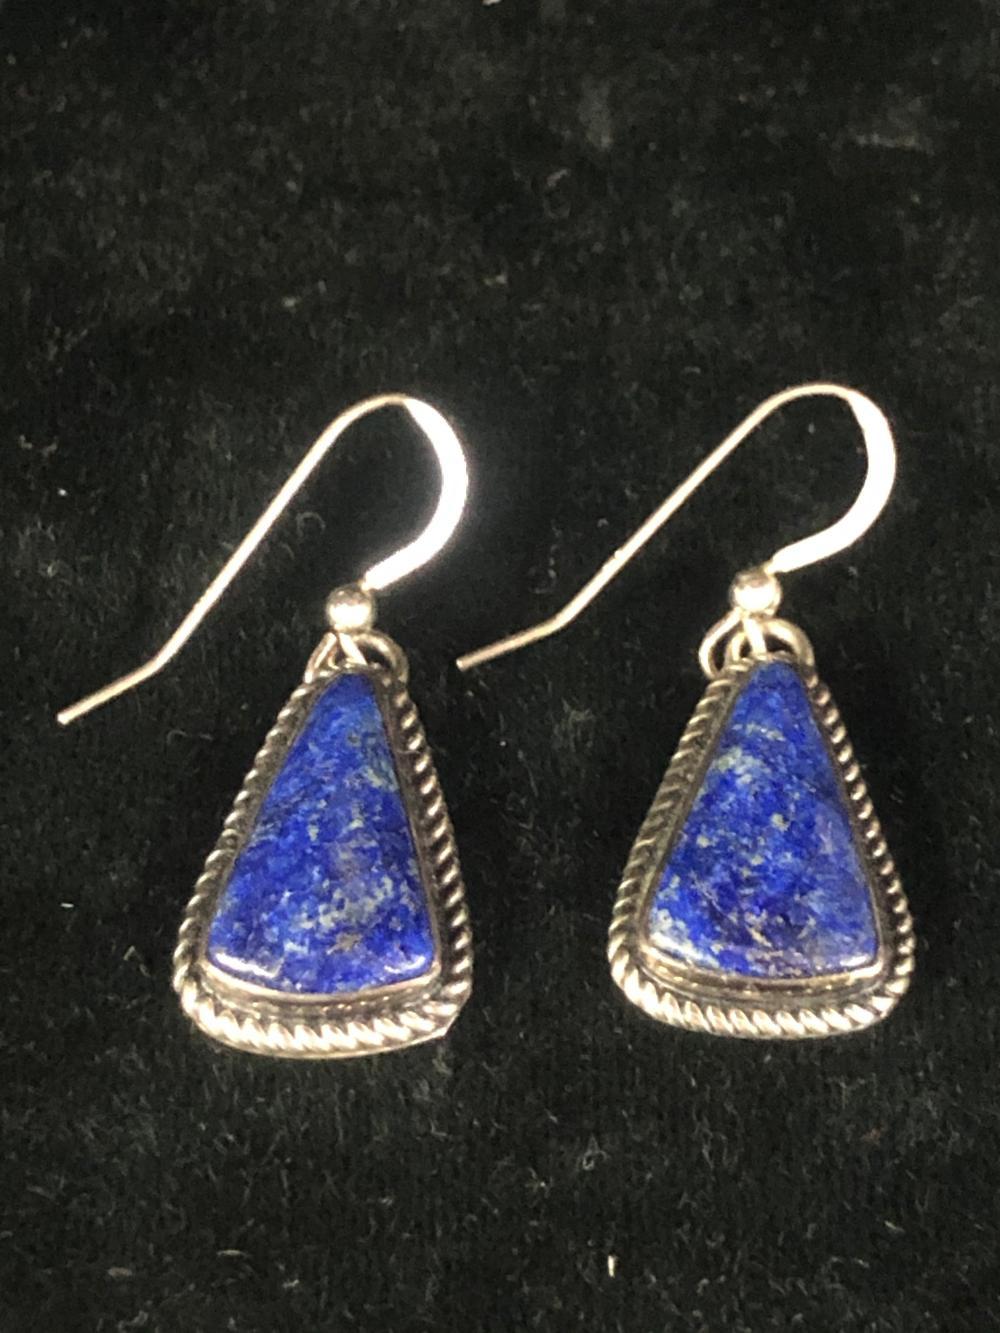 Lapis sterling silver earrings marked